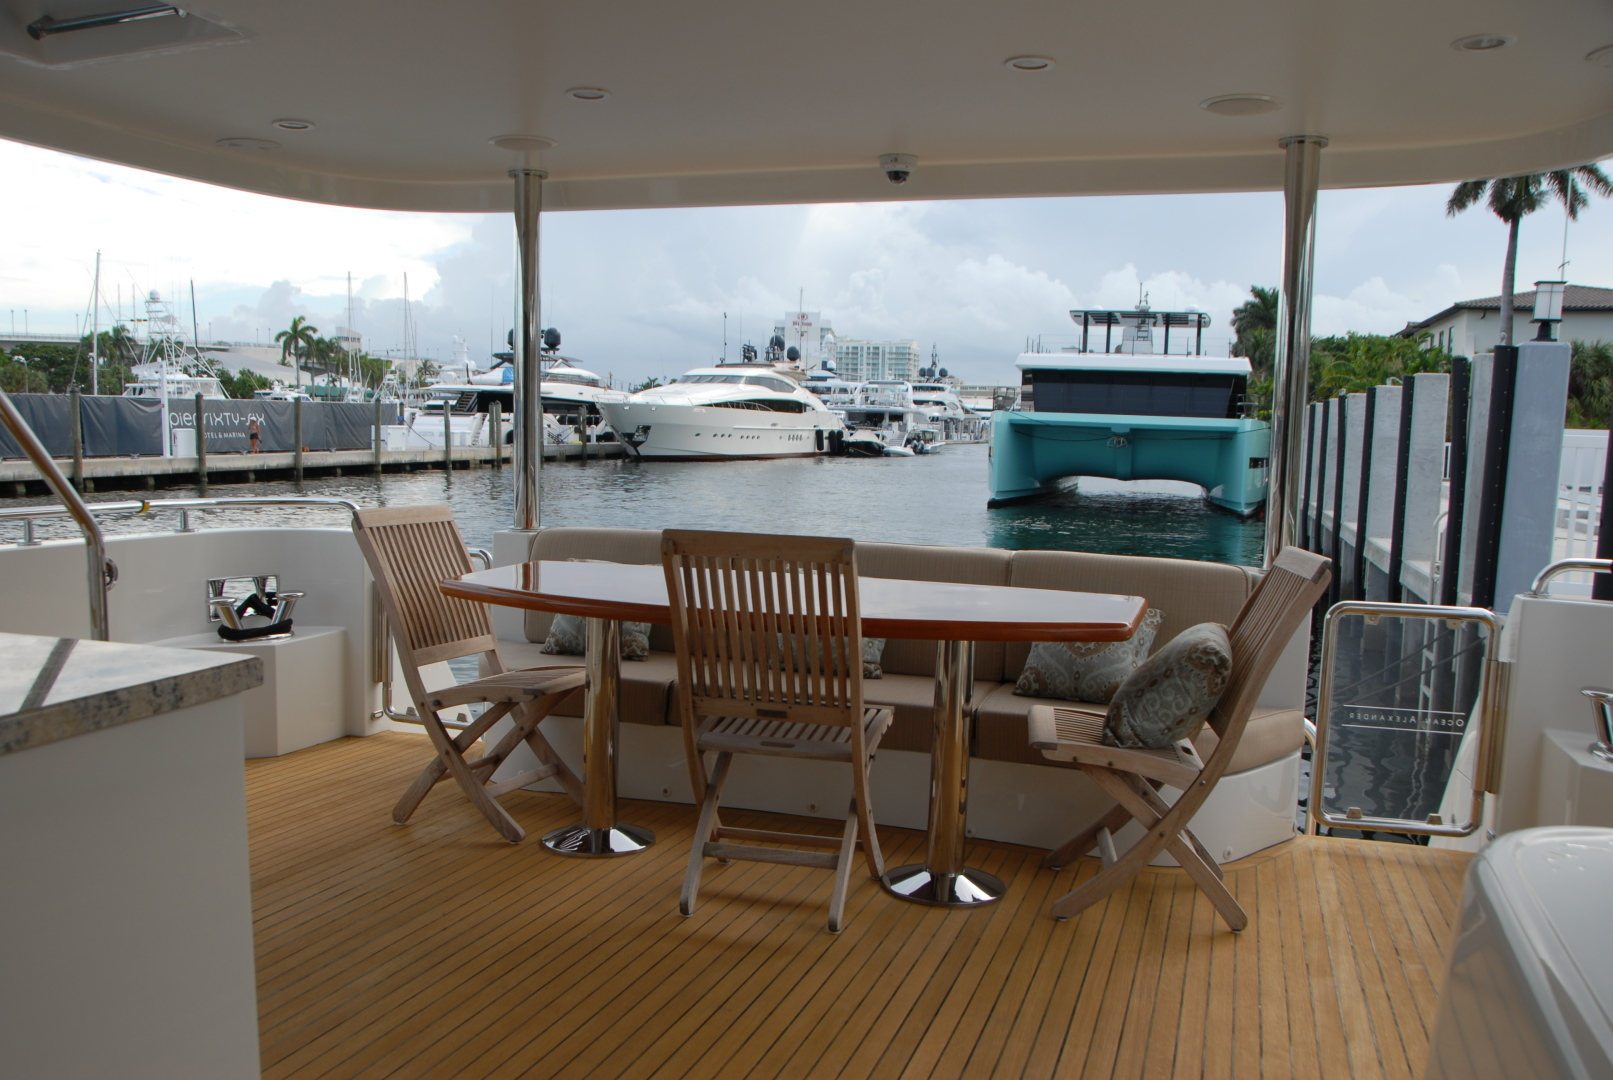 Ocean Alexander-Motor yacht flybridge 2016-Journey Fort Lauderdale-Florida-United States-1451229 | Thumbnail